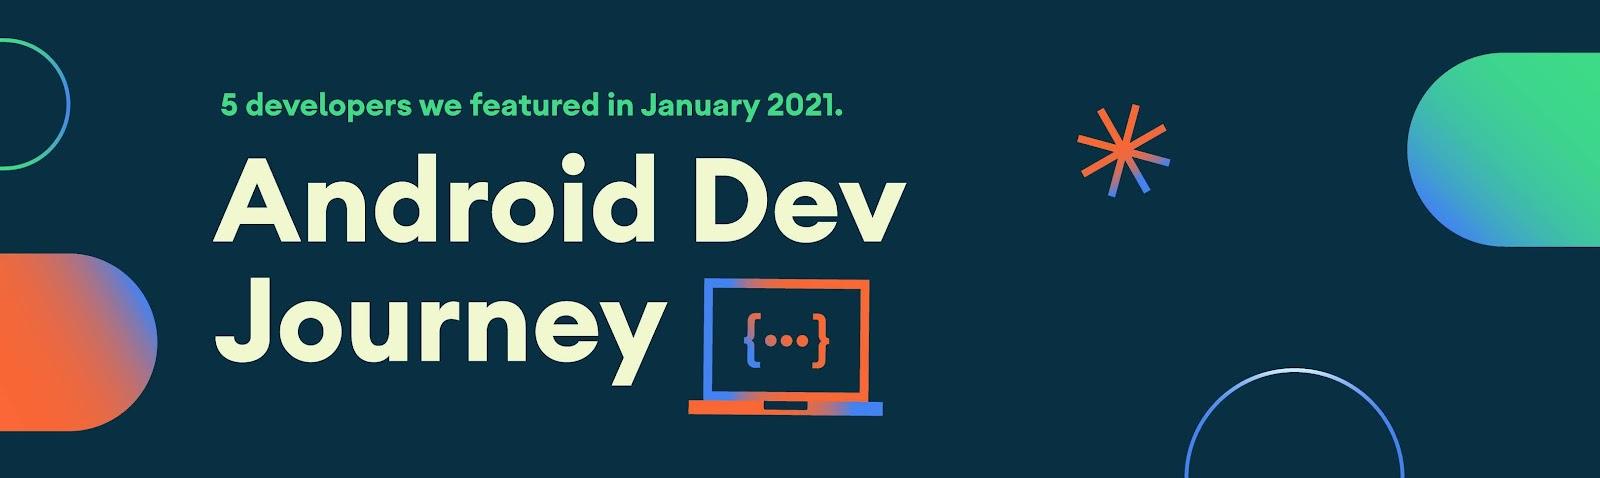 Android Dev Journey라는 문구가 포함된 헤더 이미지